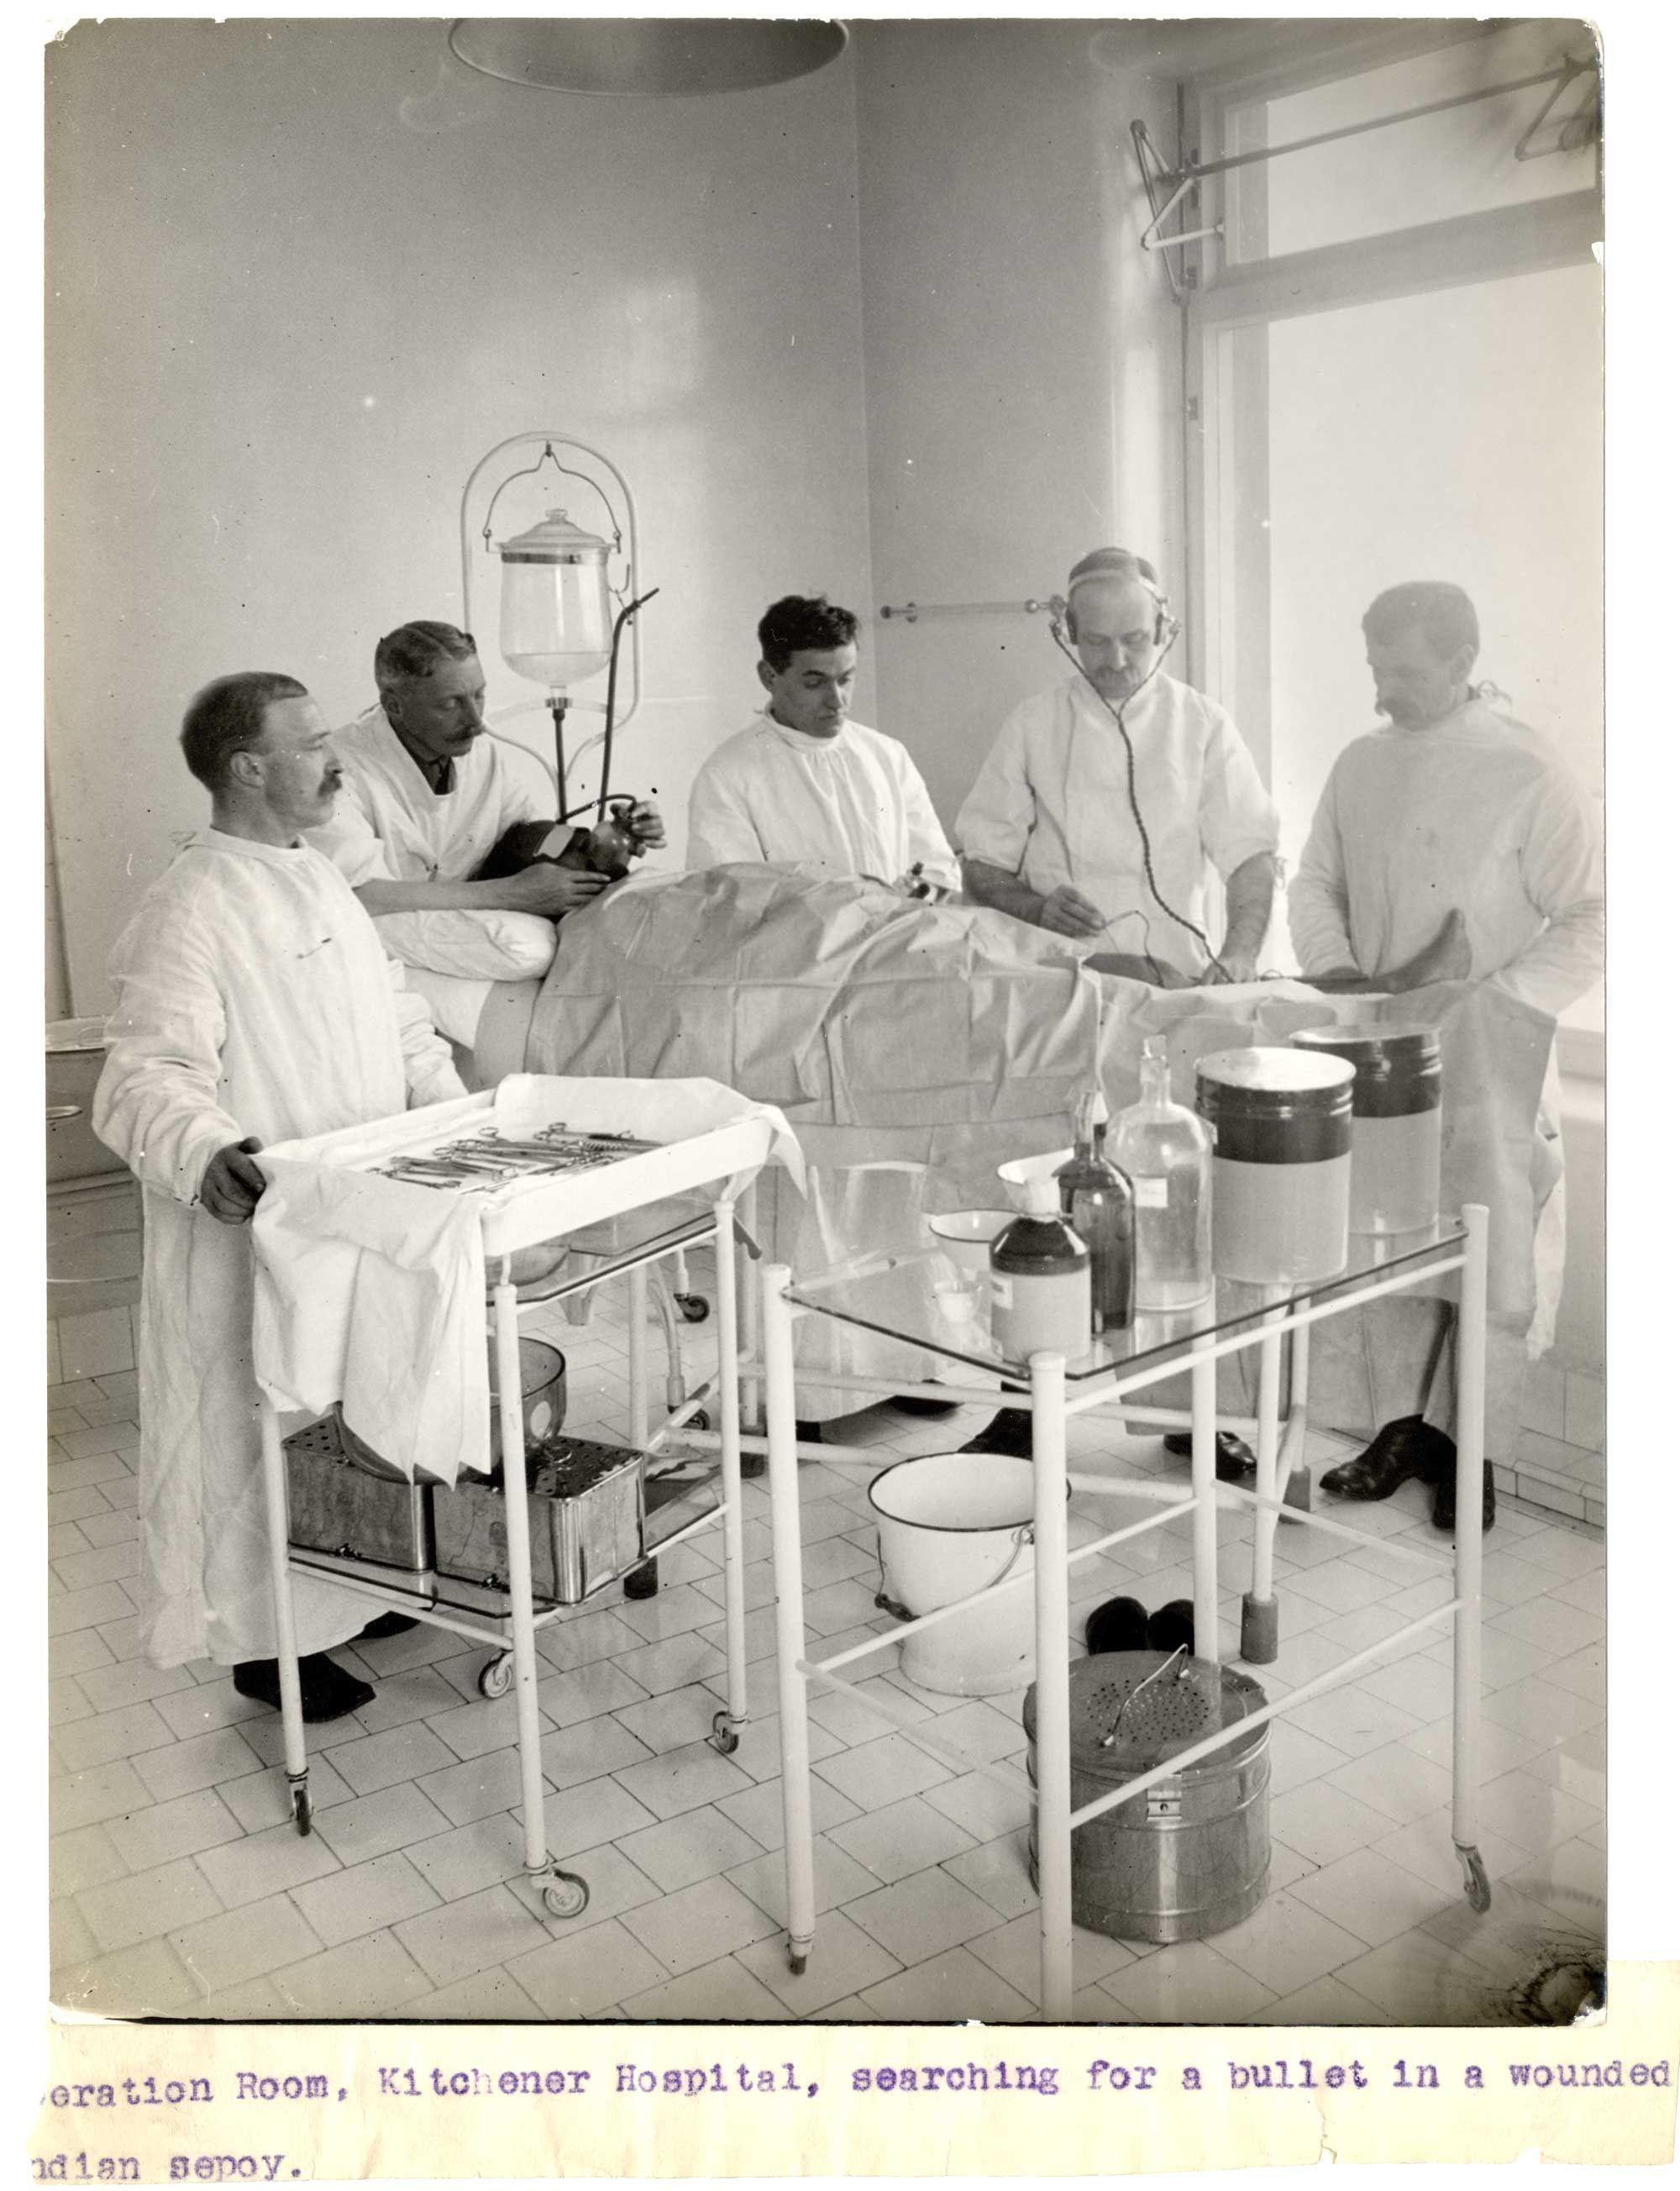 war medical rooms - Google Search | Style/Mood (Artwork) | Pinterest ...